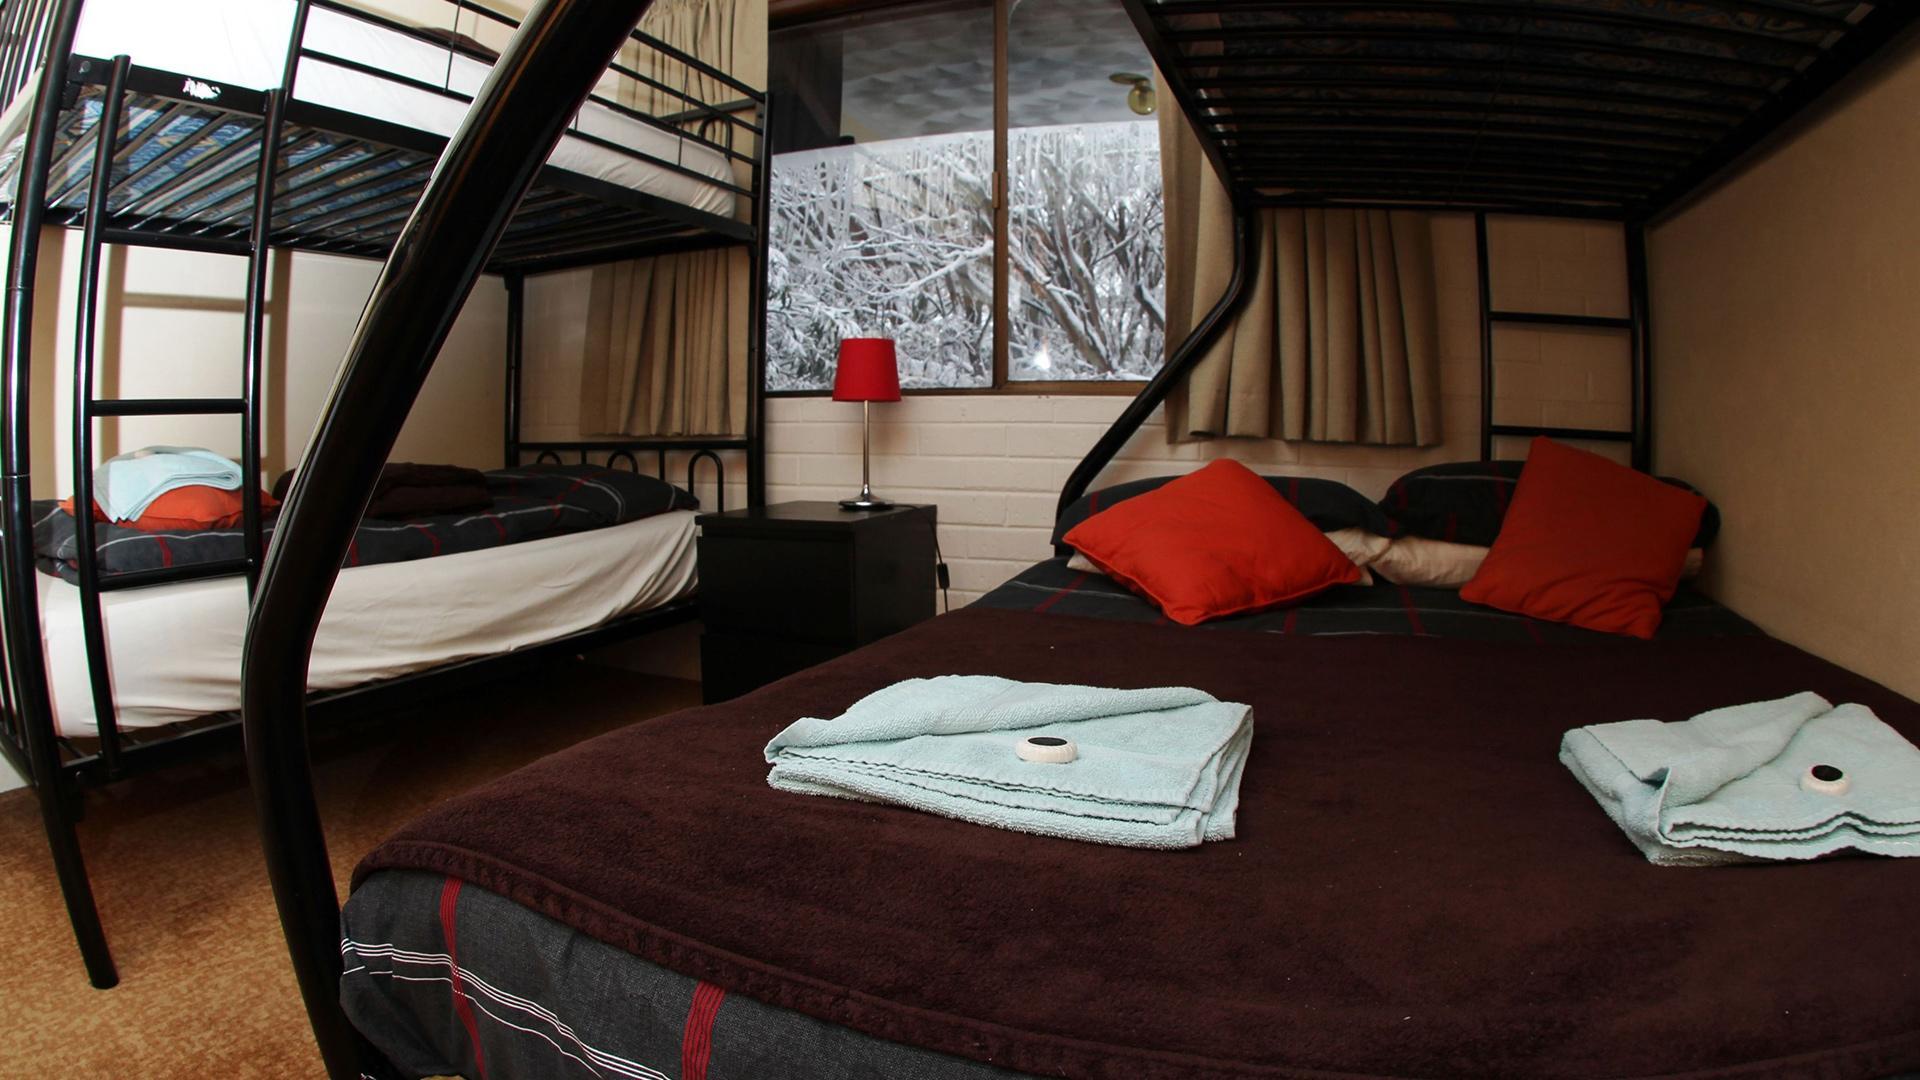 Alpine Family Room image 1 at Alpine Retreat Mt Buller by Mount Buller Alpine Resort (Unincorporated), Victoria, Australia